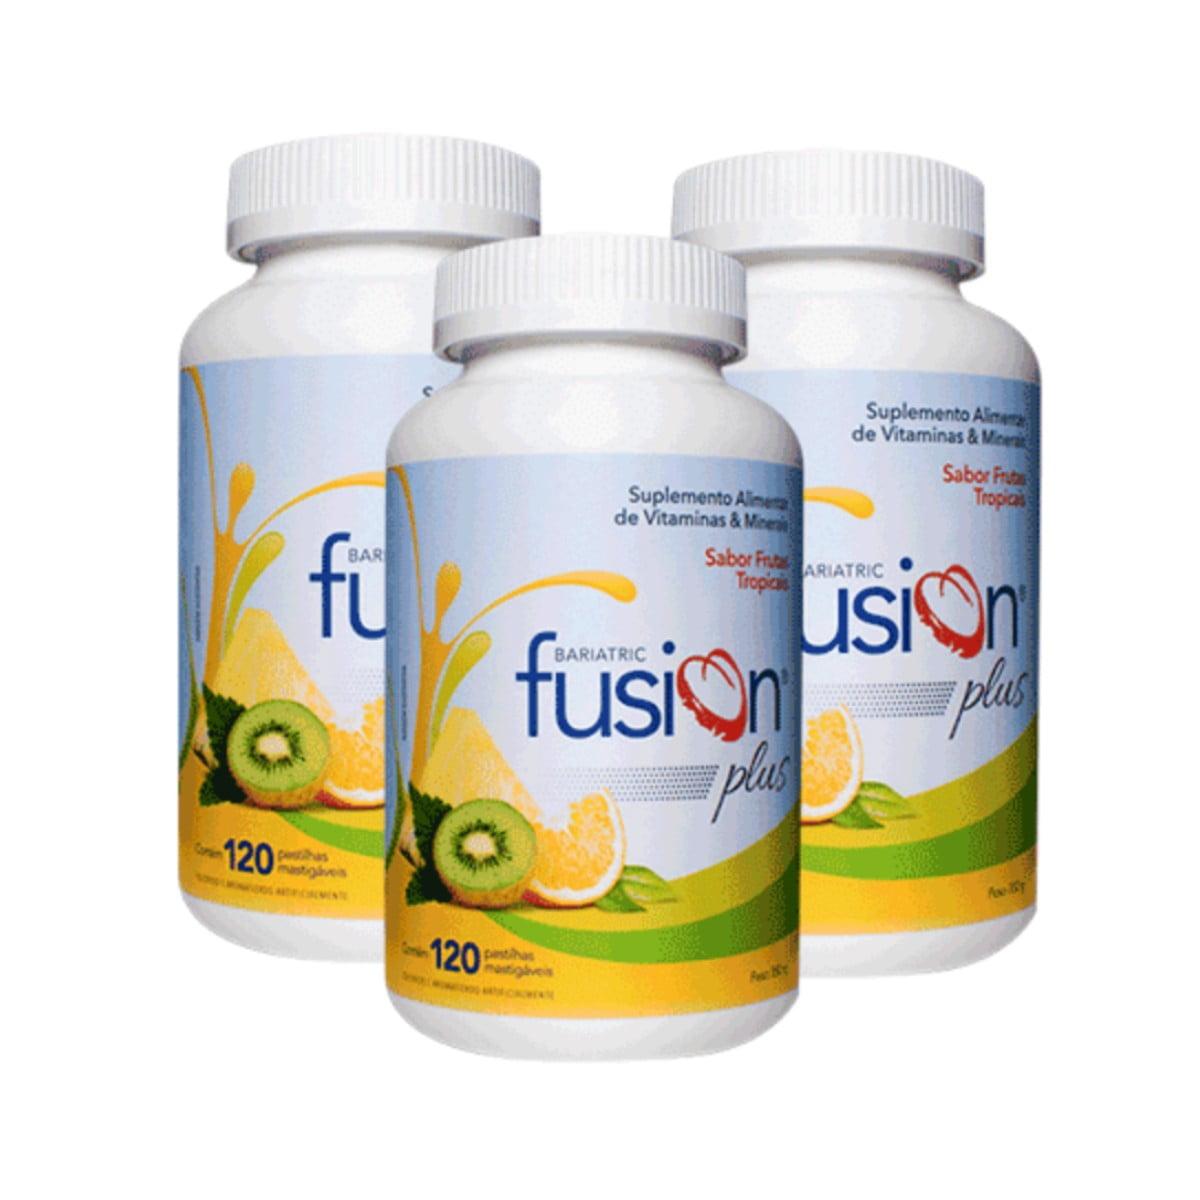 Kit c/3 Bariatric Fusion Plus 120 Pastilhas Mastigáveis - Sabor Frutas Tropicais